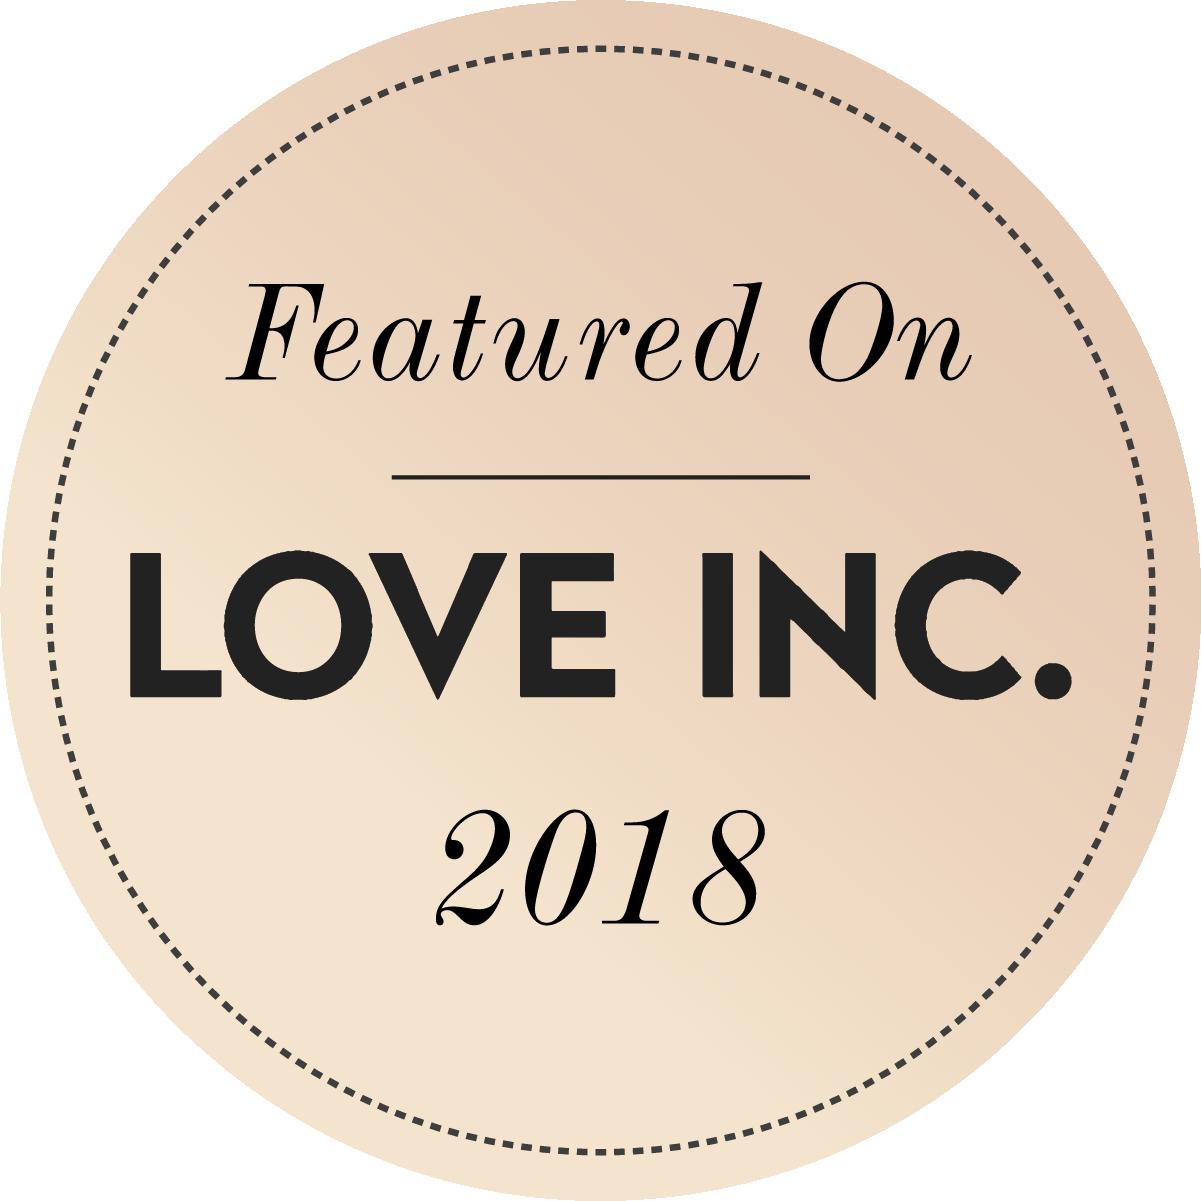 Love inc_badge_peach combo.png